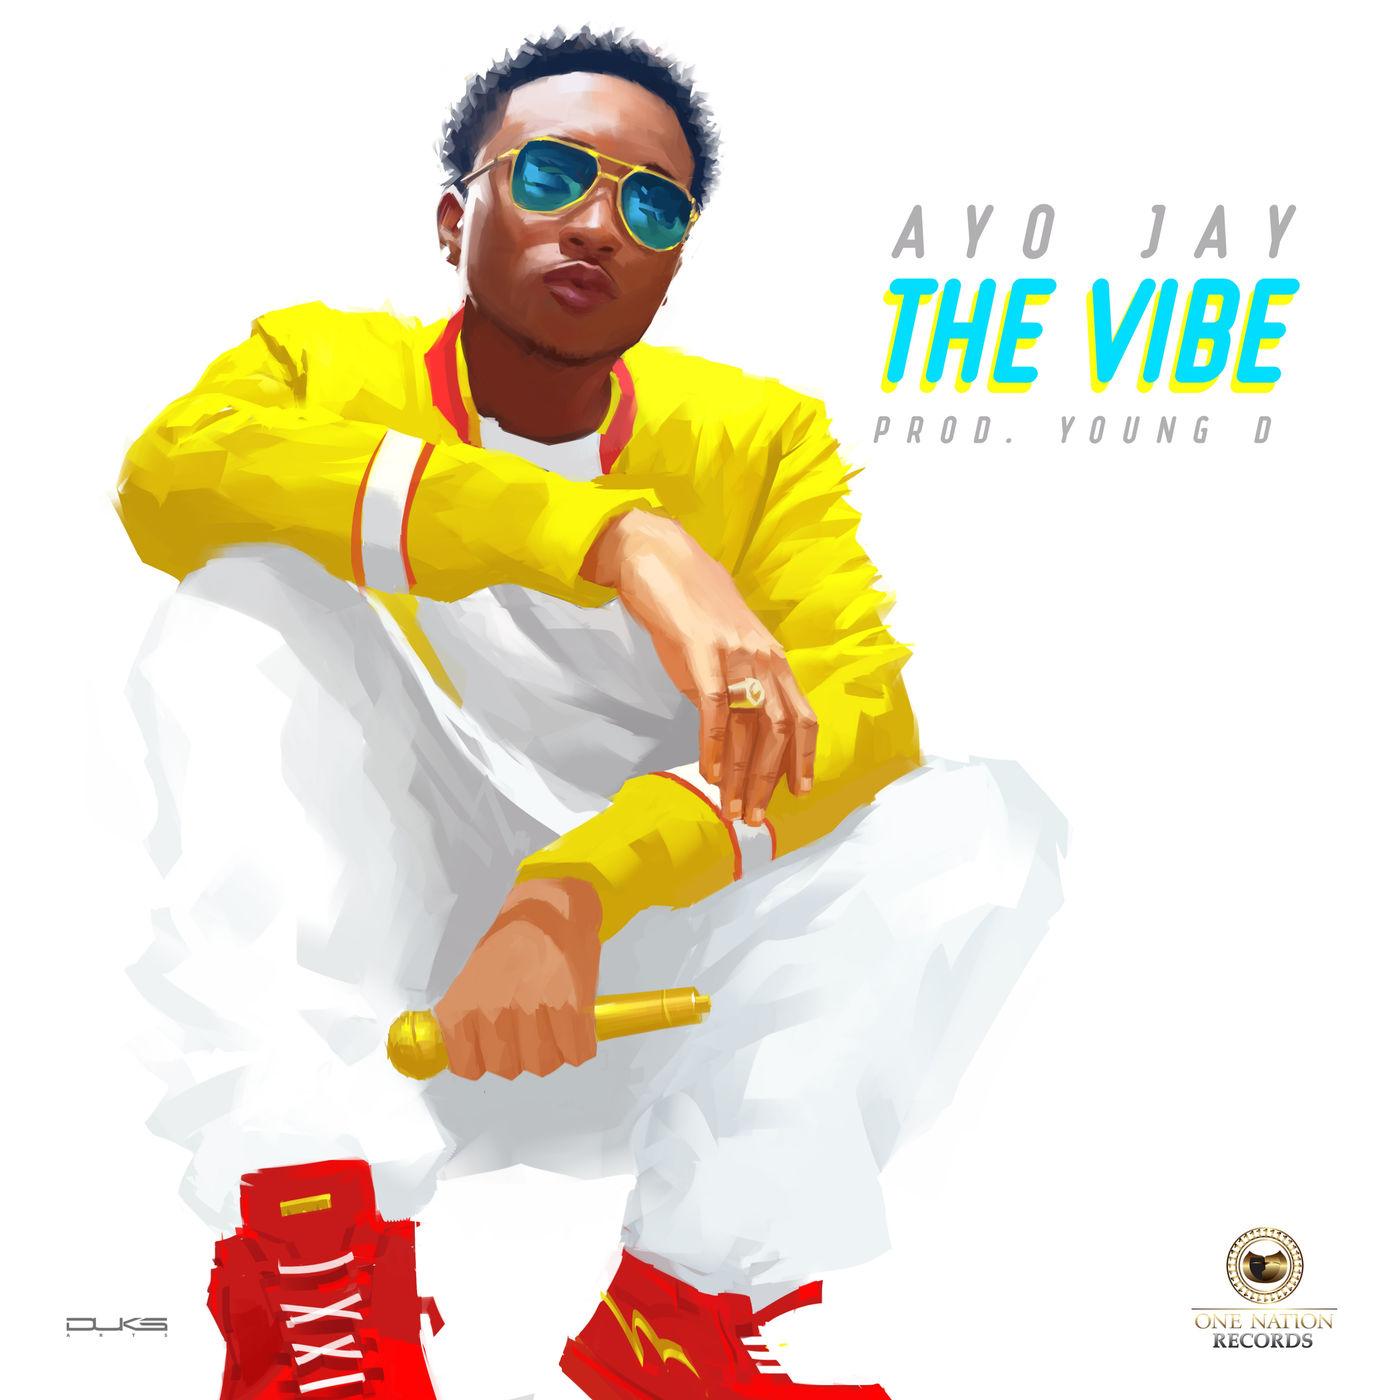 Ayo Jay - The Vibe - Single Cover